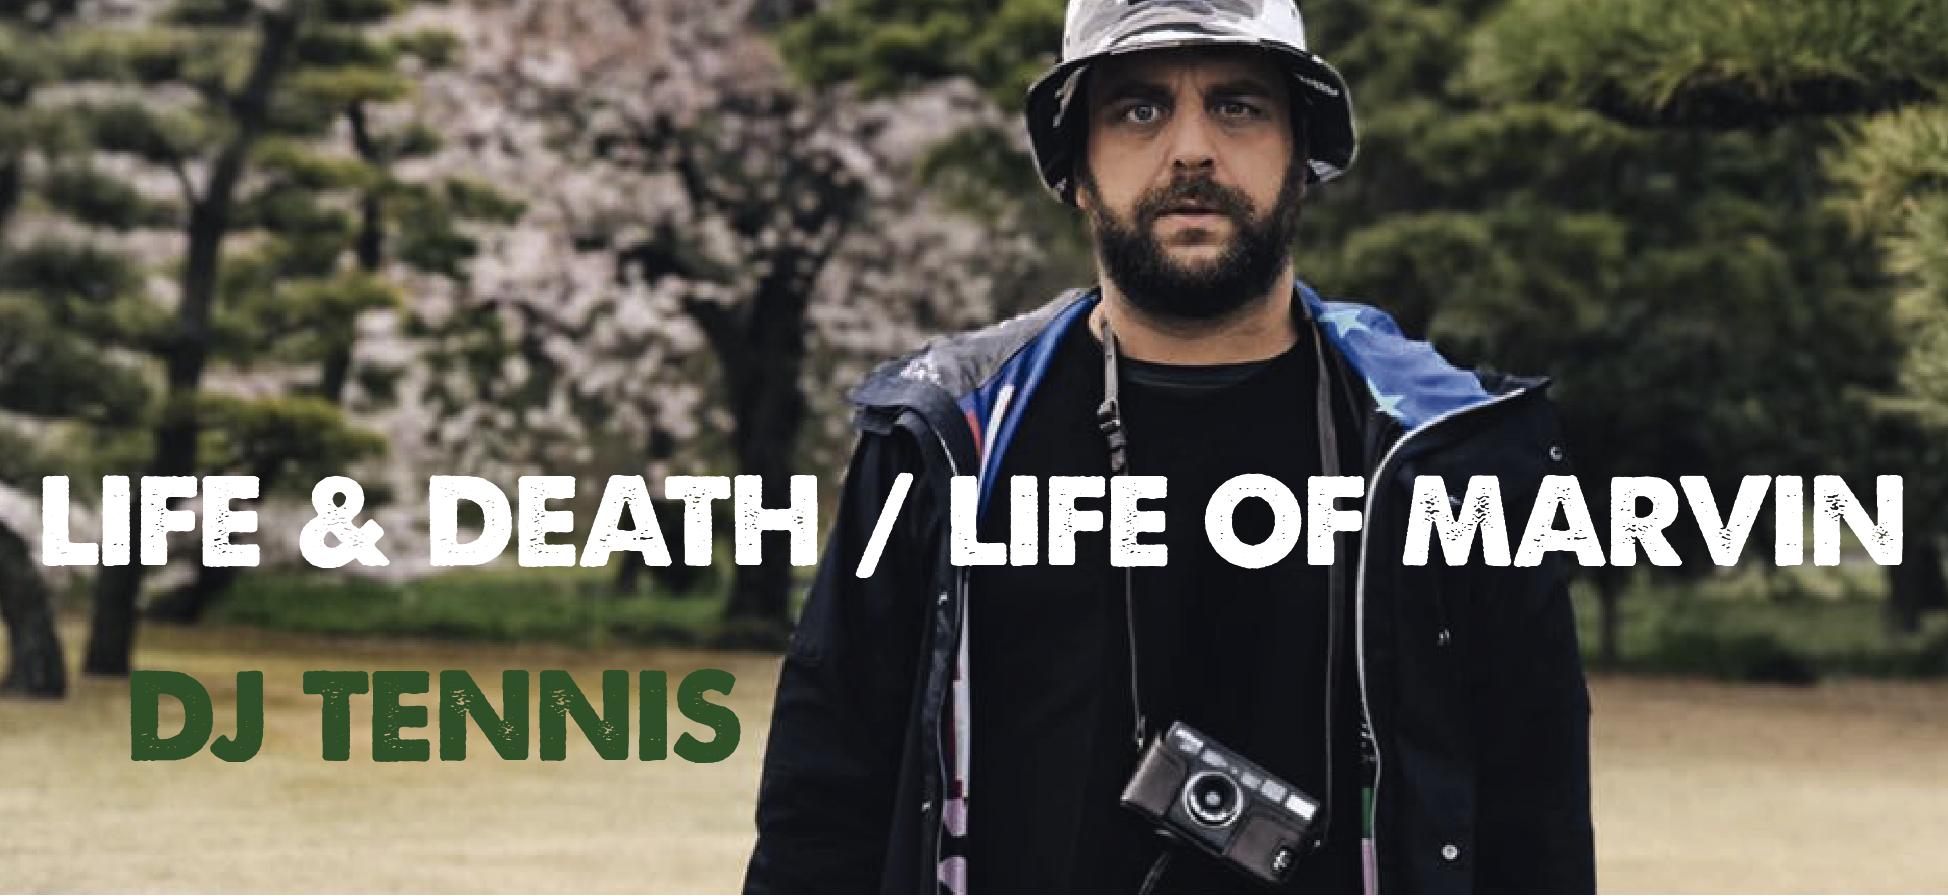 Profile: DJ TENNIS